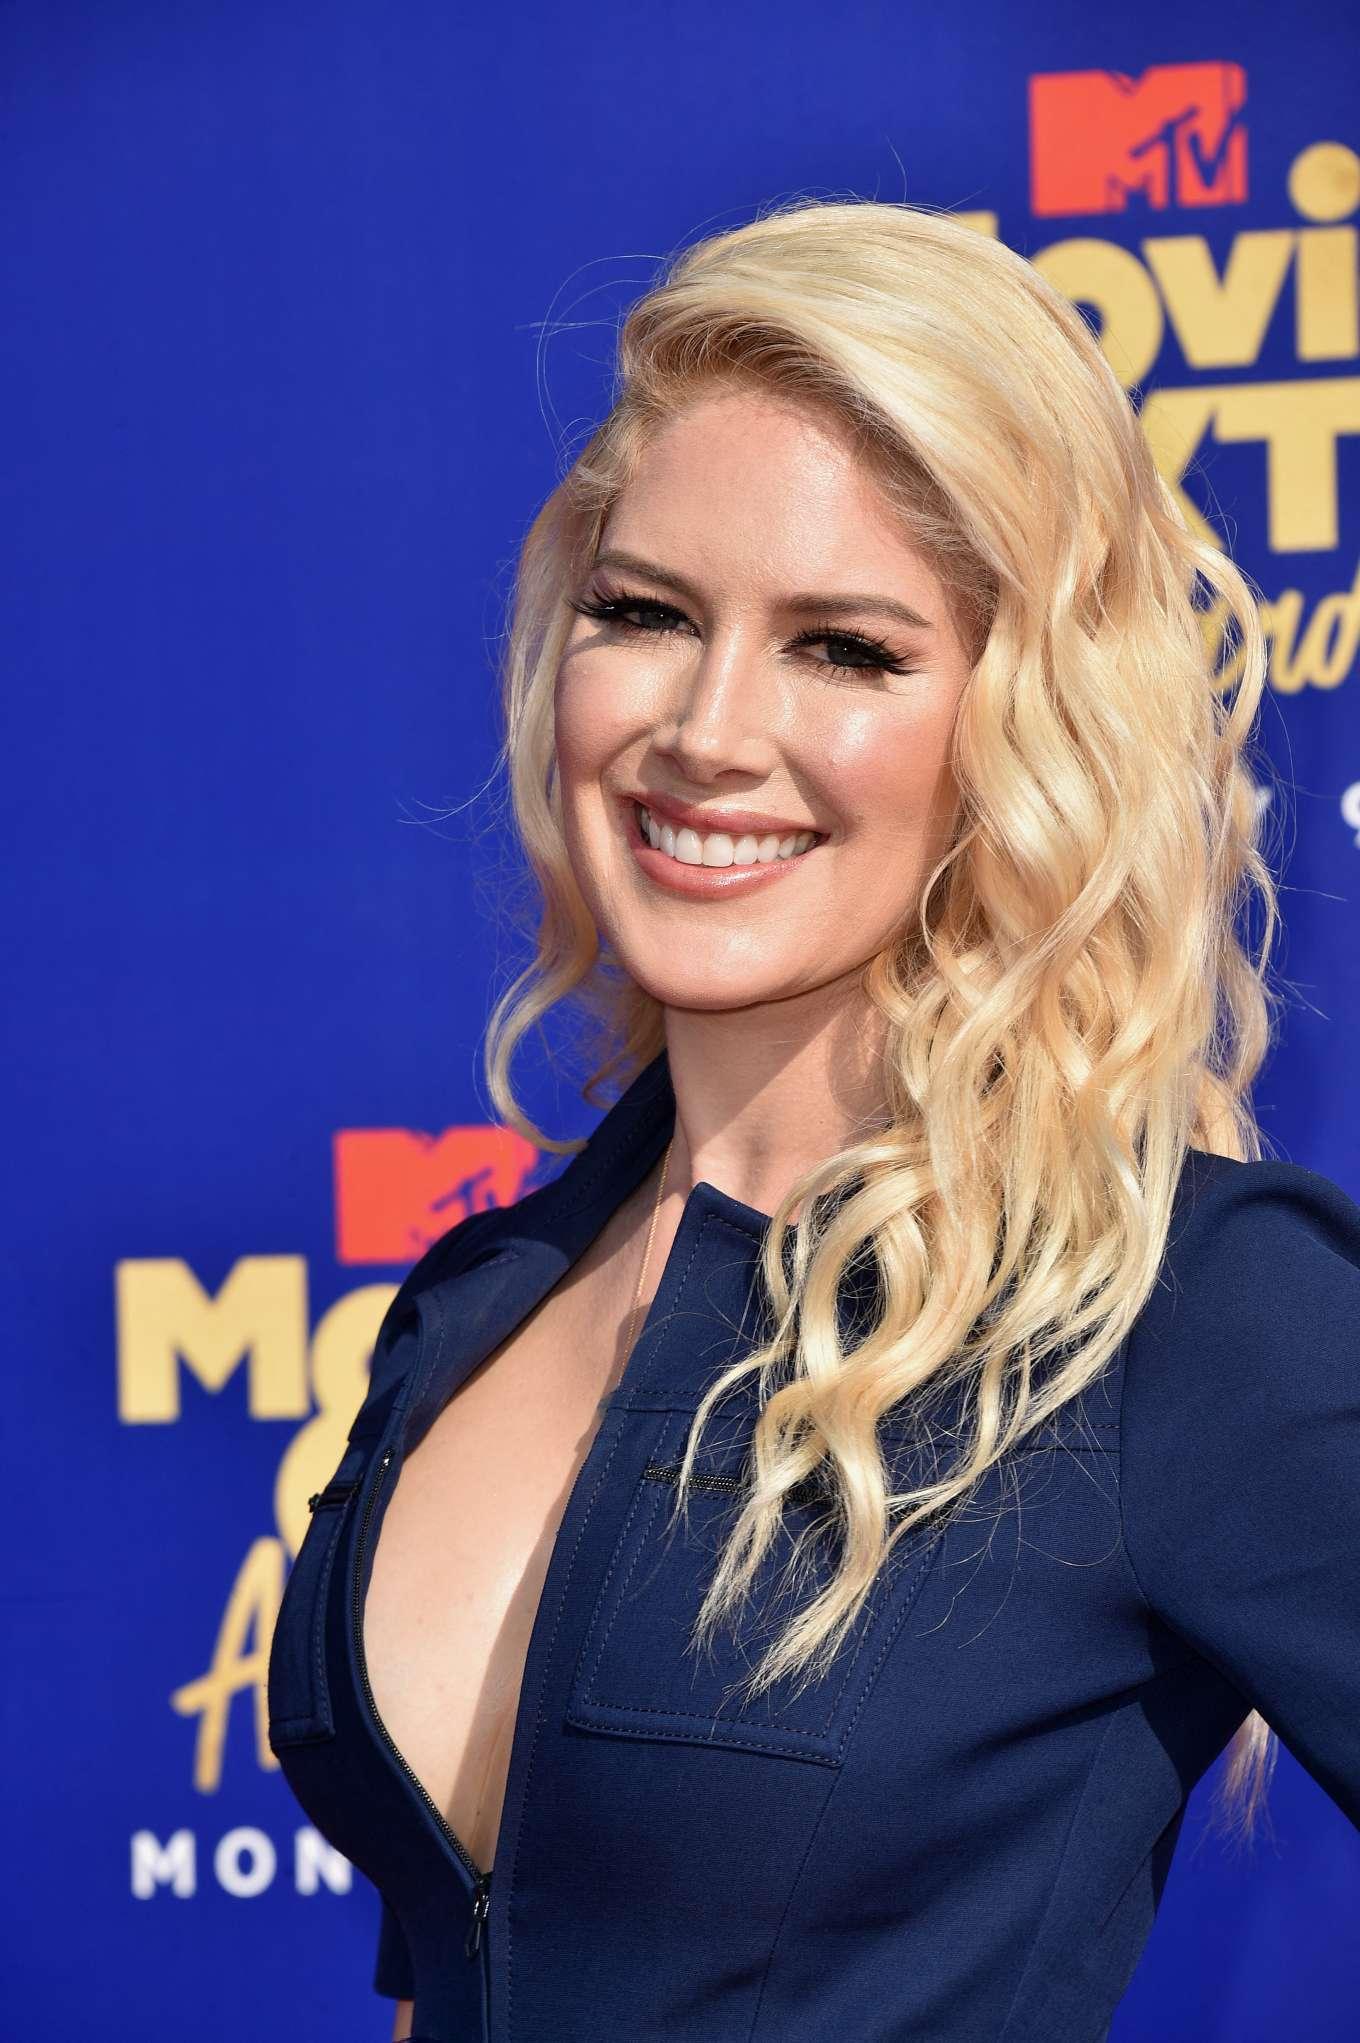 Heidi Montag 2019 : Heidi Montag: 2019 MTV Movie and TV Awards Red Carpet-01